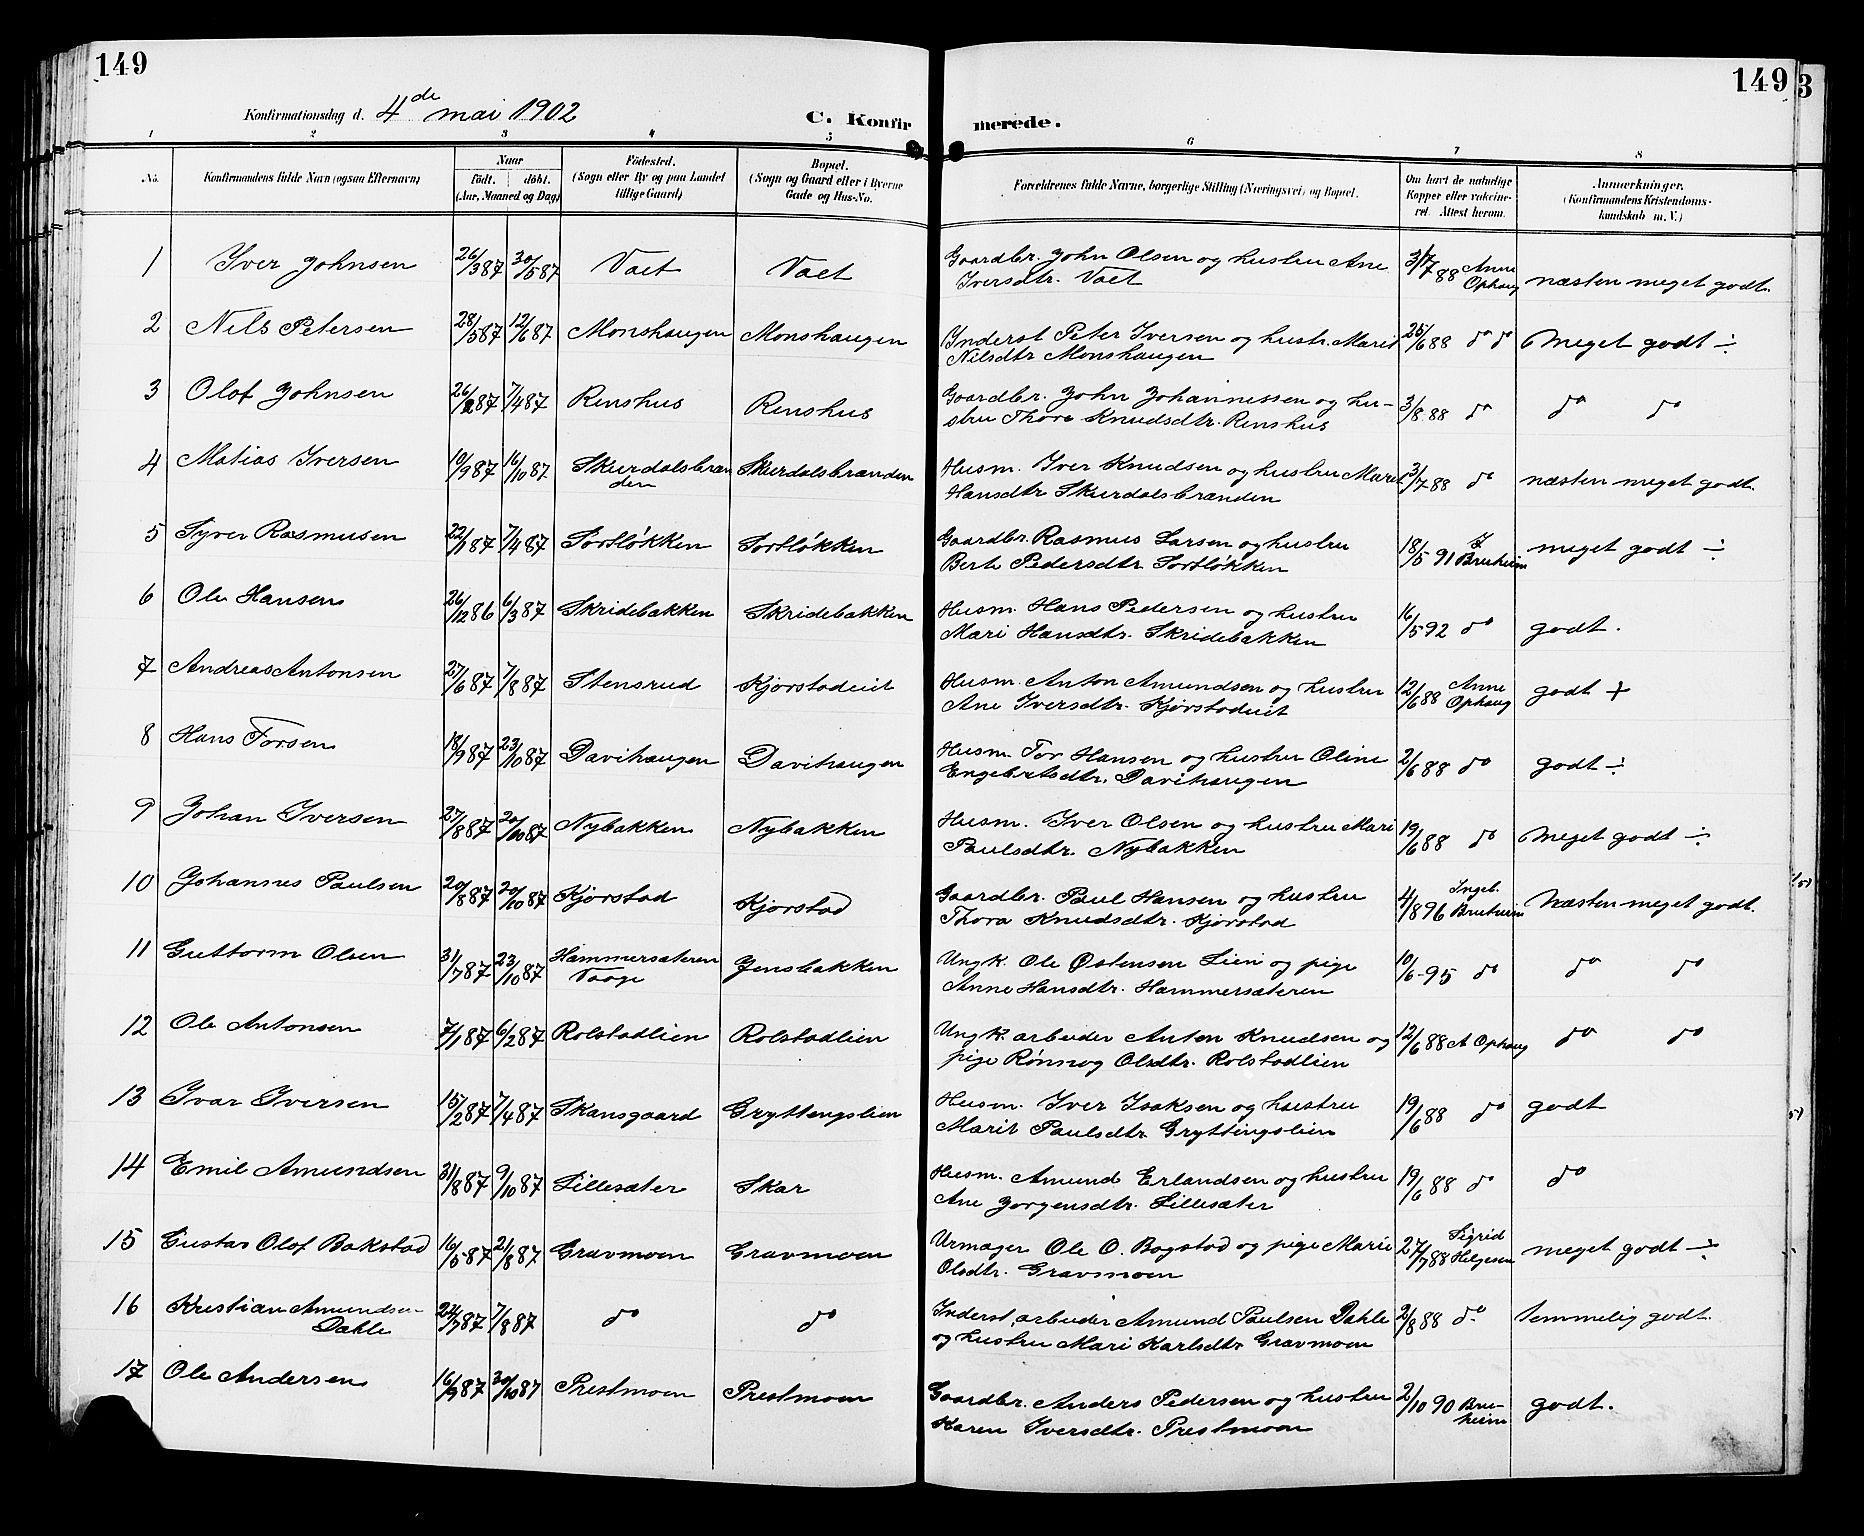 SAH, Sør-Fron prestekontor, H/Ha/Hab/L0004: Klokkerbok nr. 4, 1896-1911, s. 149